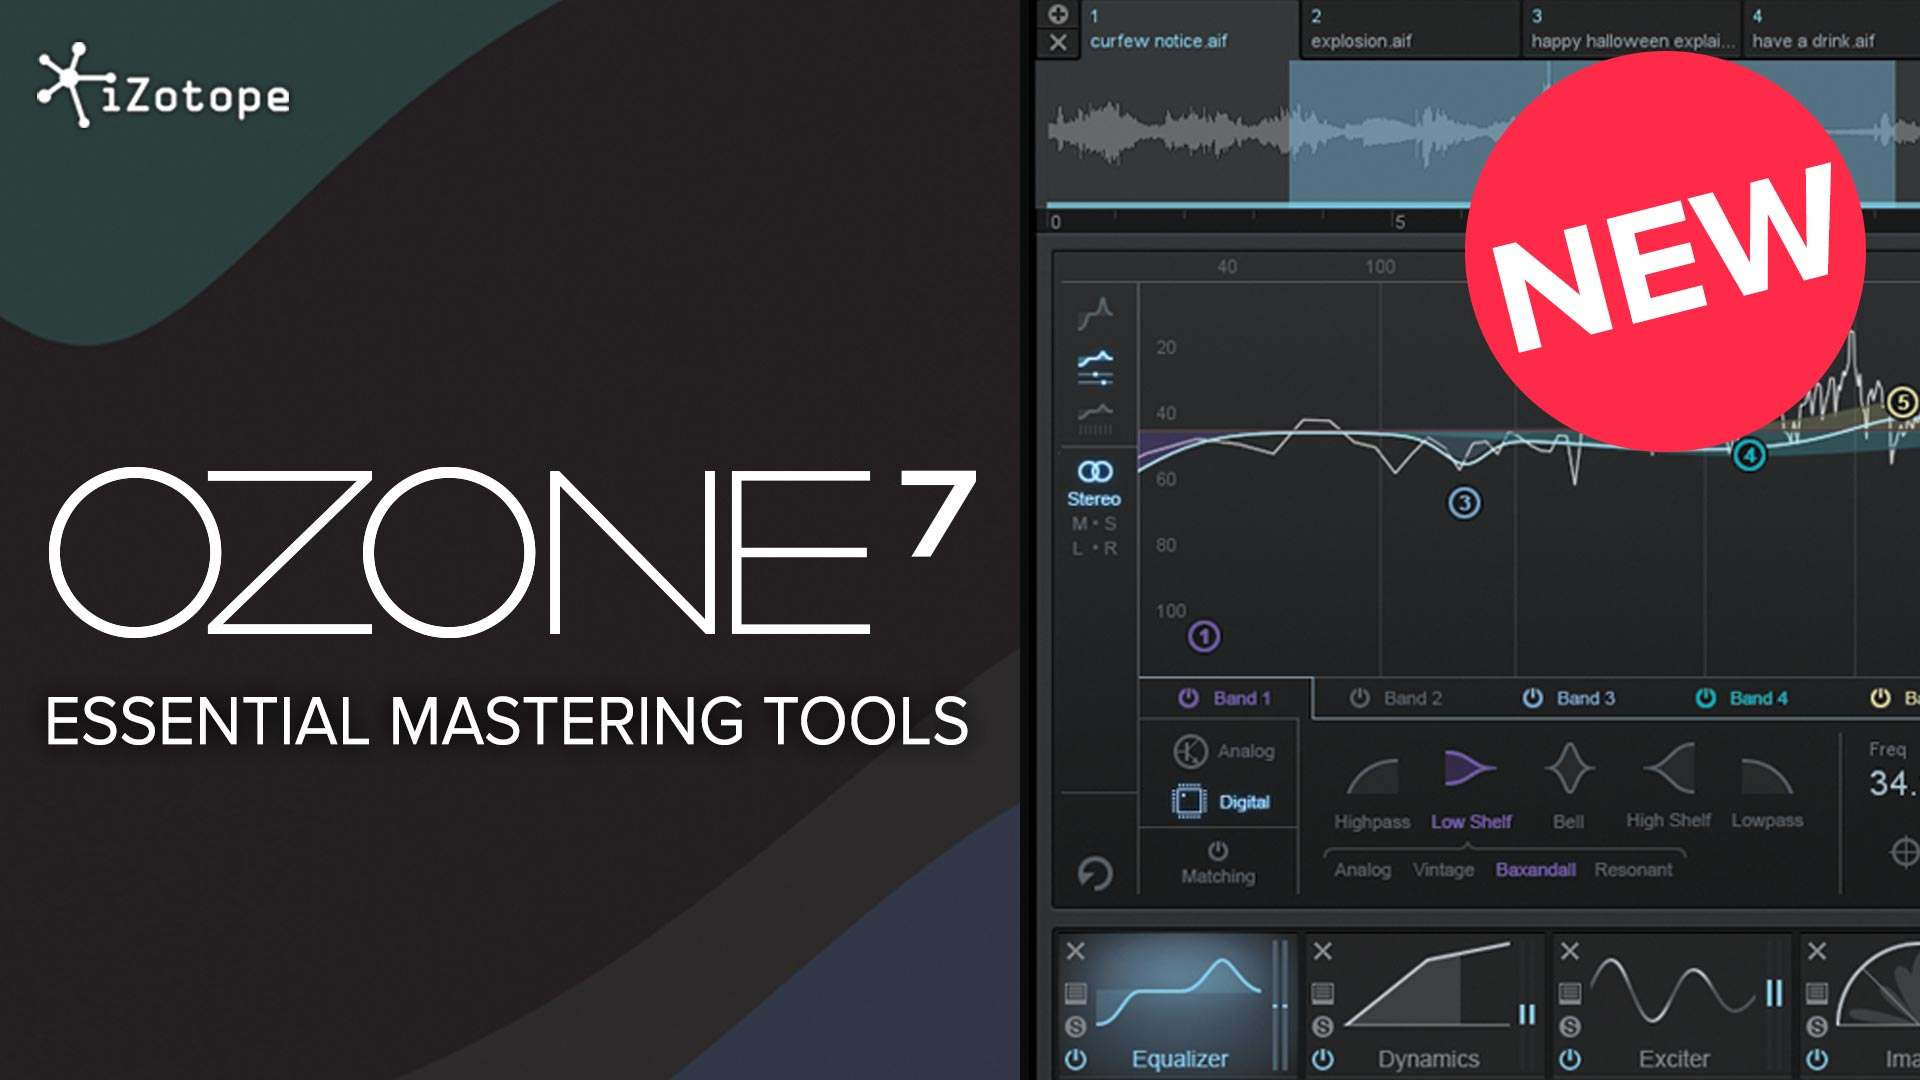 iZotope Ozone Advanced 7 Crack Windows Mac ox Full Version